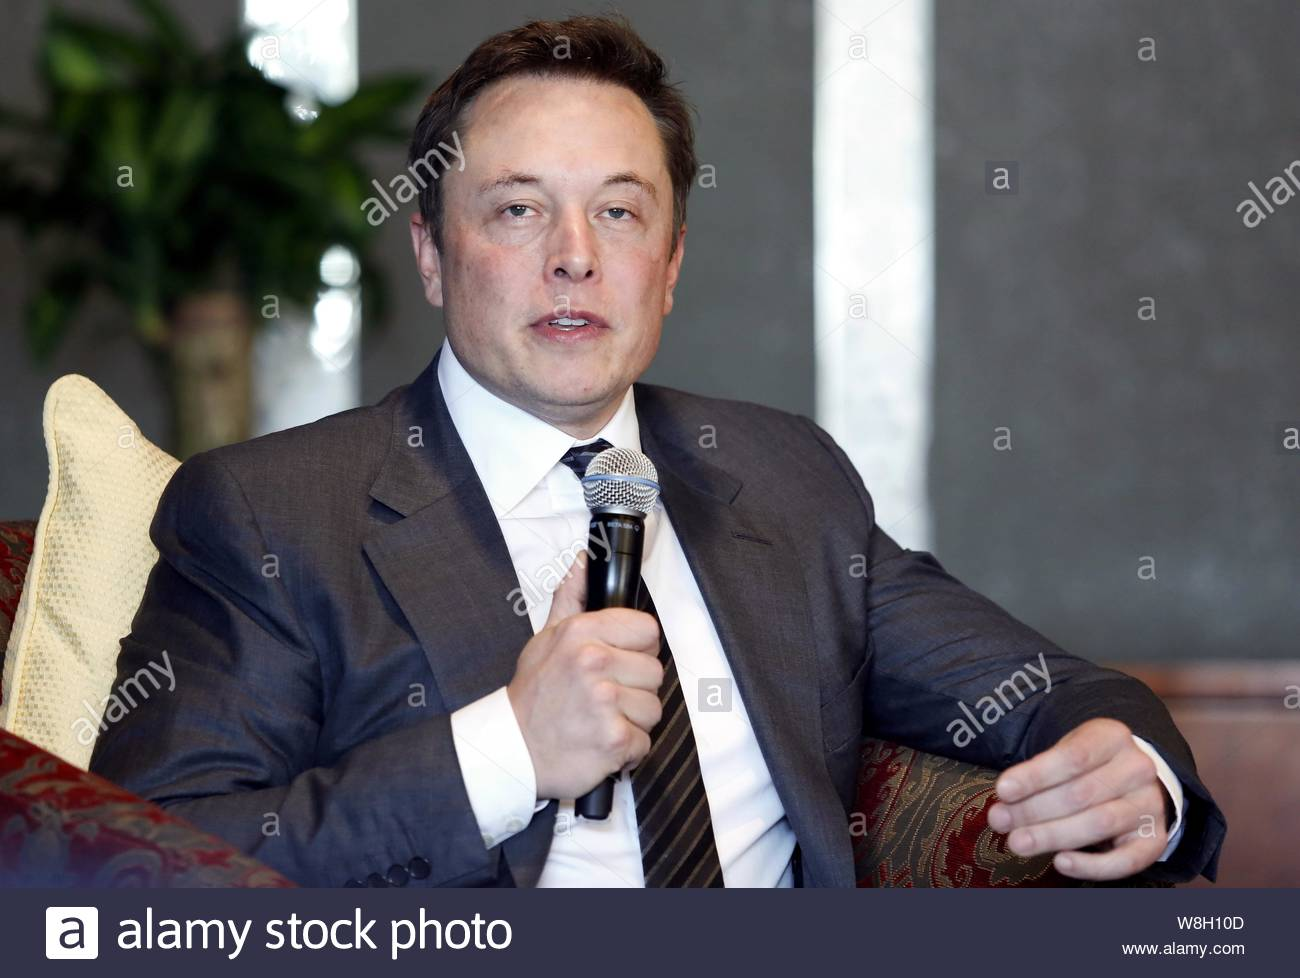 Elon Musk Stock Photos & Elon Musk Stock Images - Page 3 - Alamy